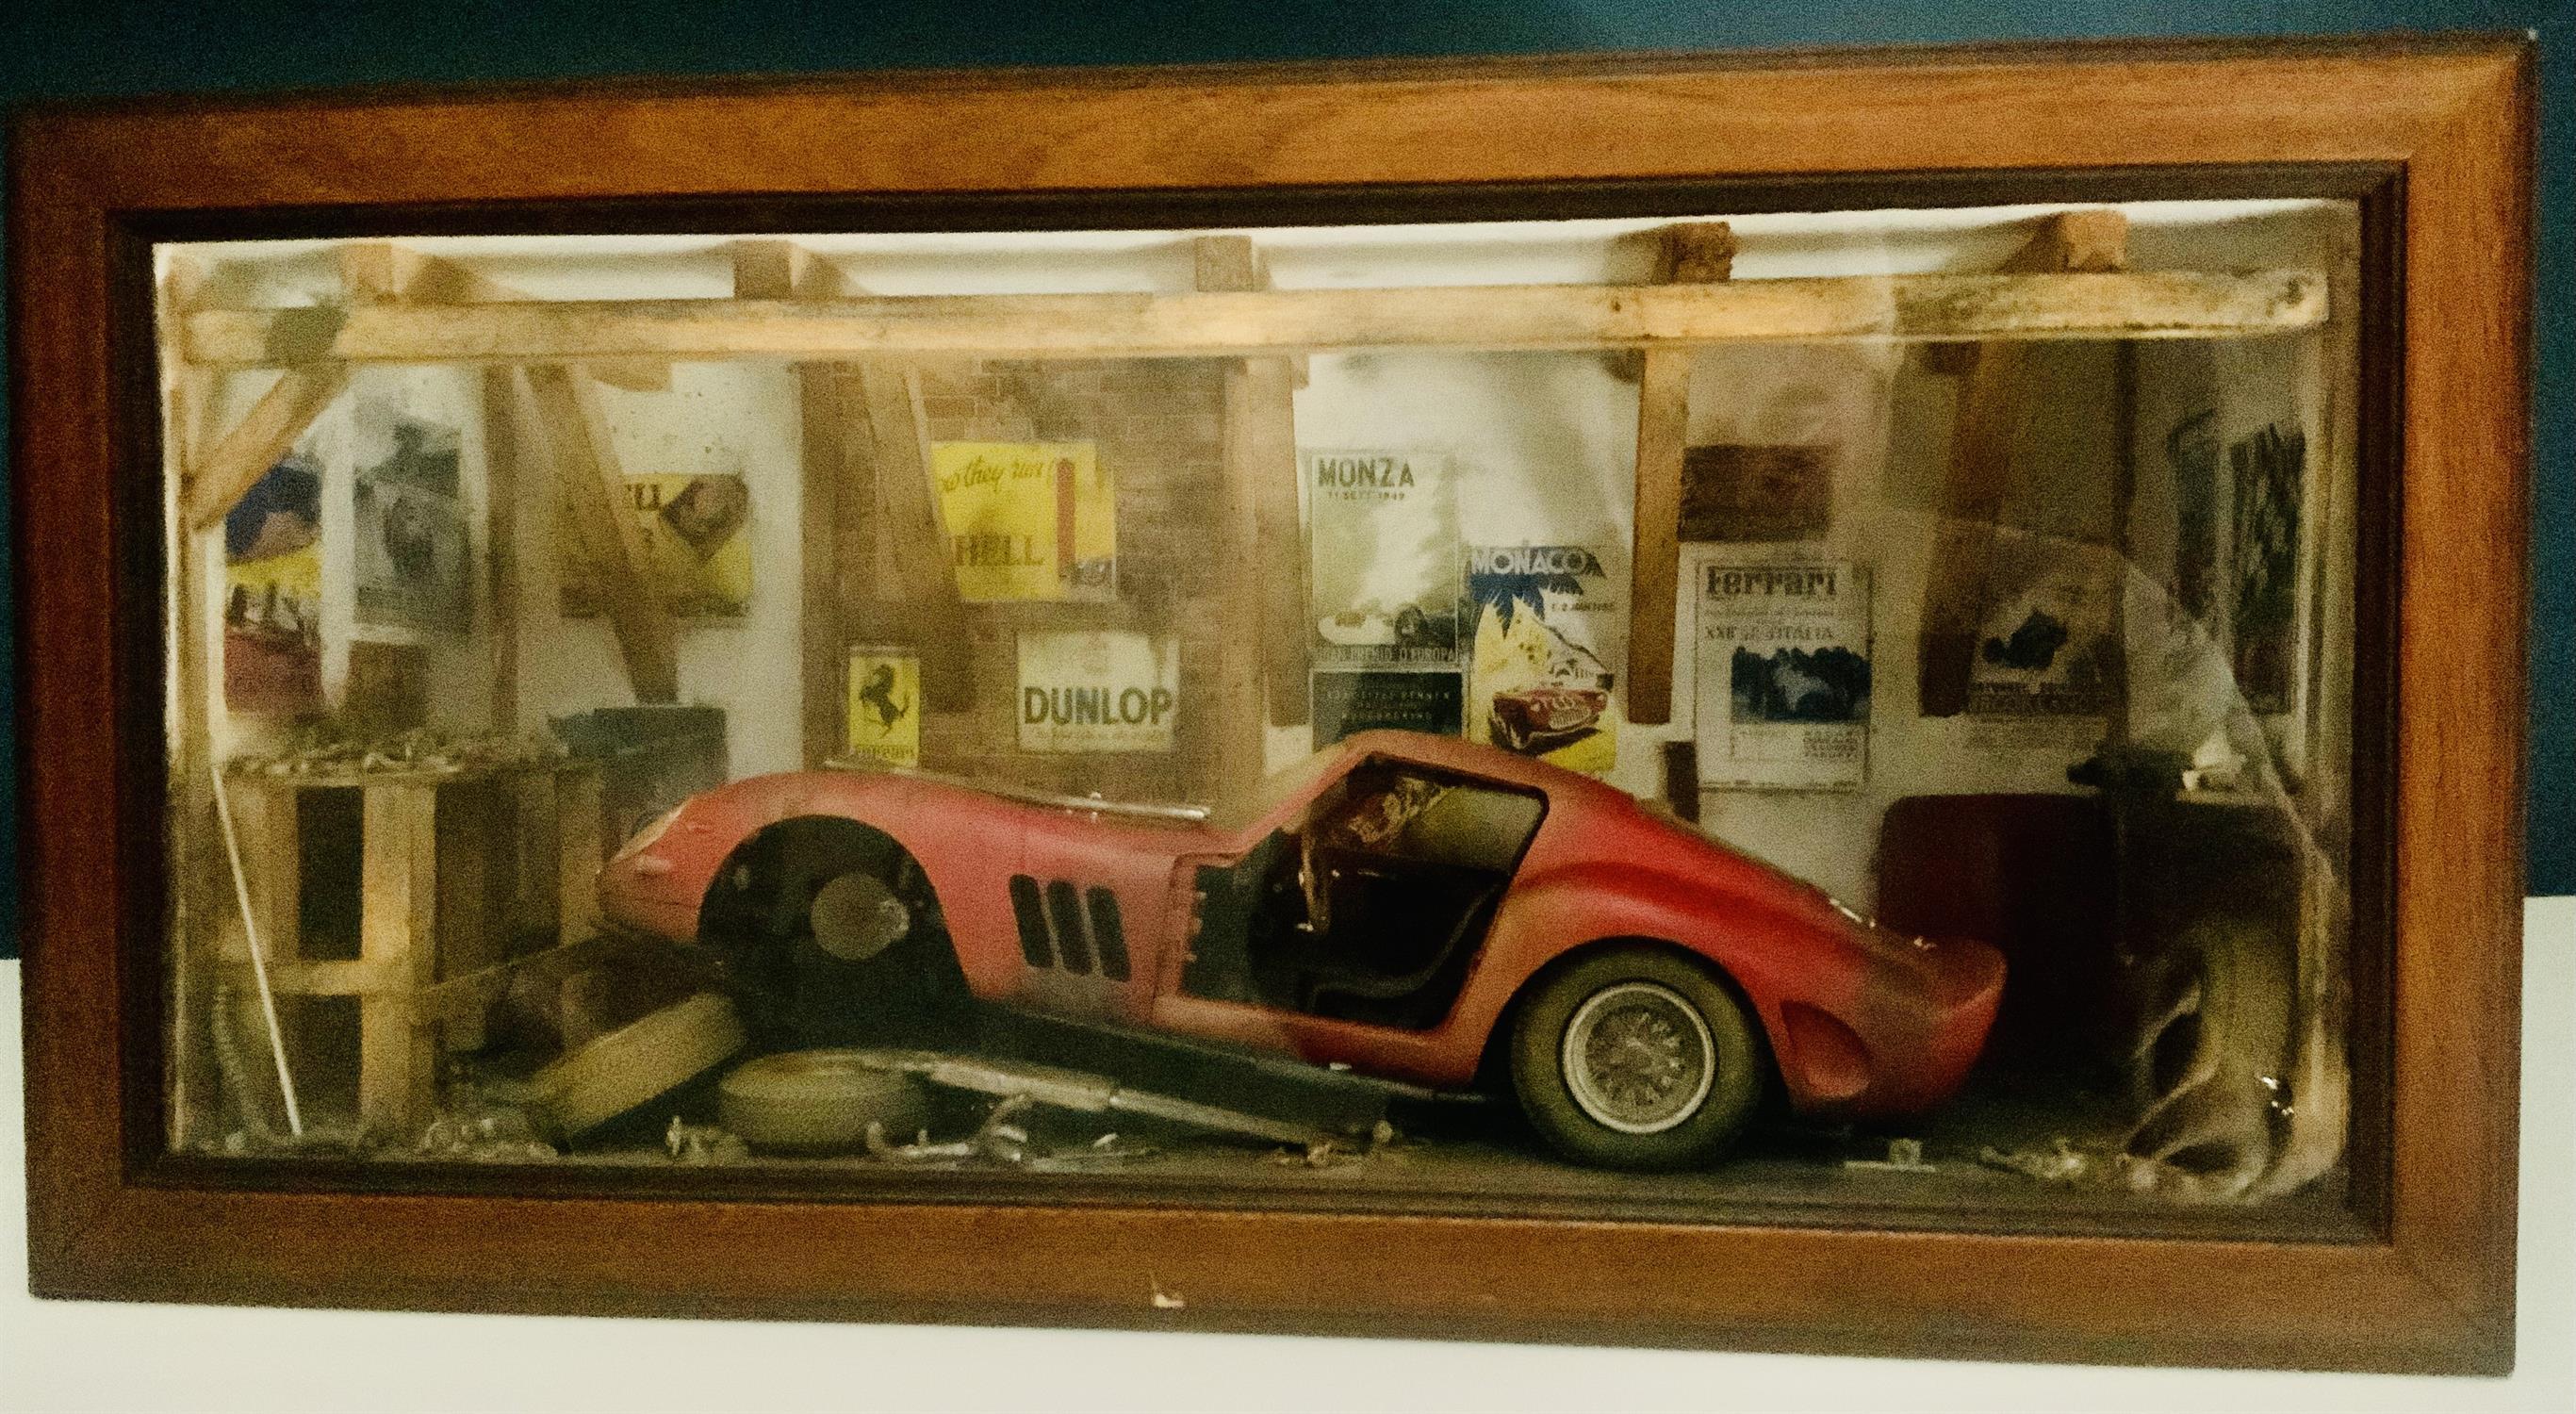 Ferrari 250 GTO Diorama by Classic Car Art - Image 4 of 5